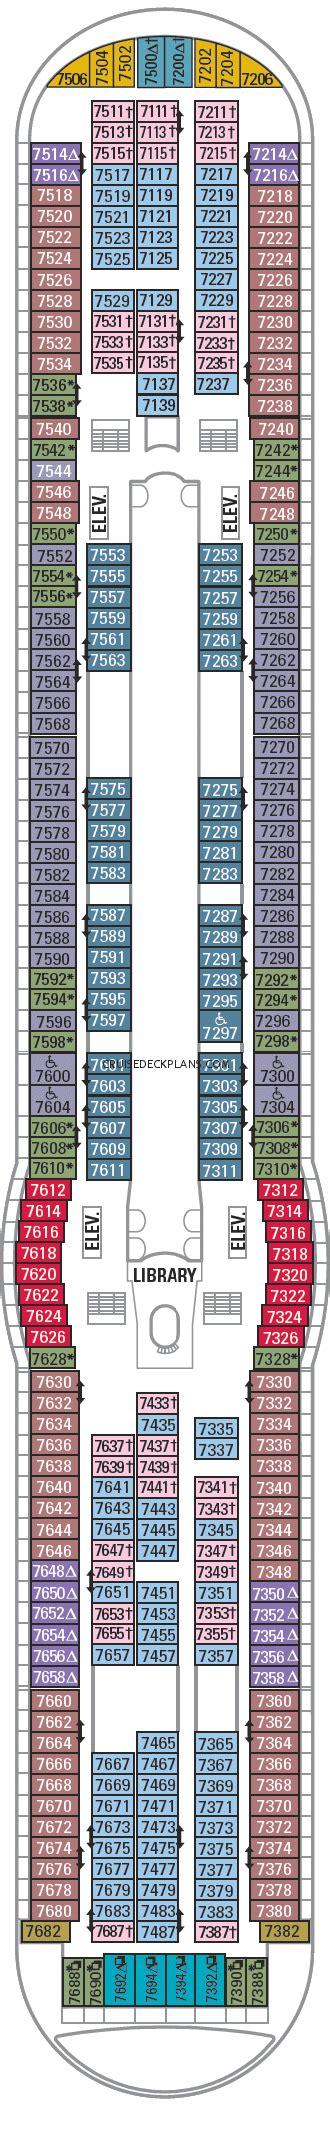 Explorer Of The Seas Deck 7 Deck Plan Tour